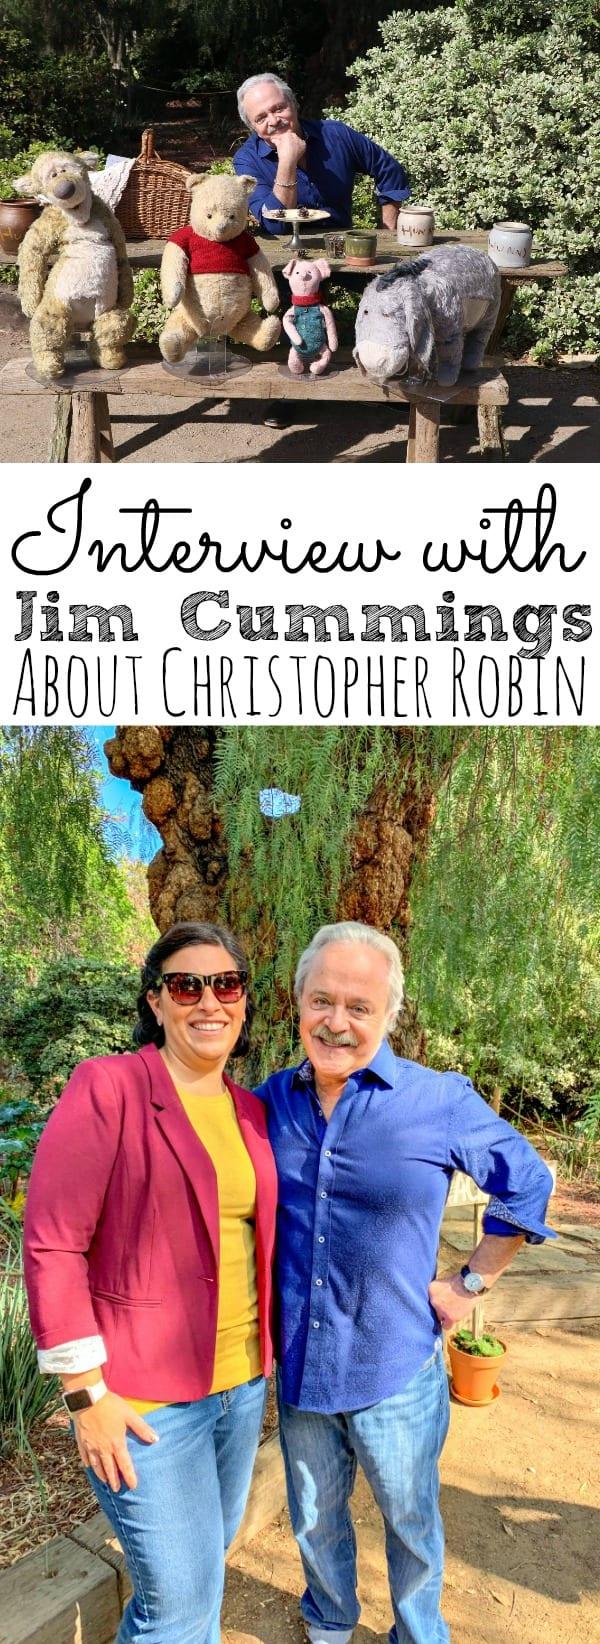 Jim Cummings Interview Christopher Robin